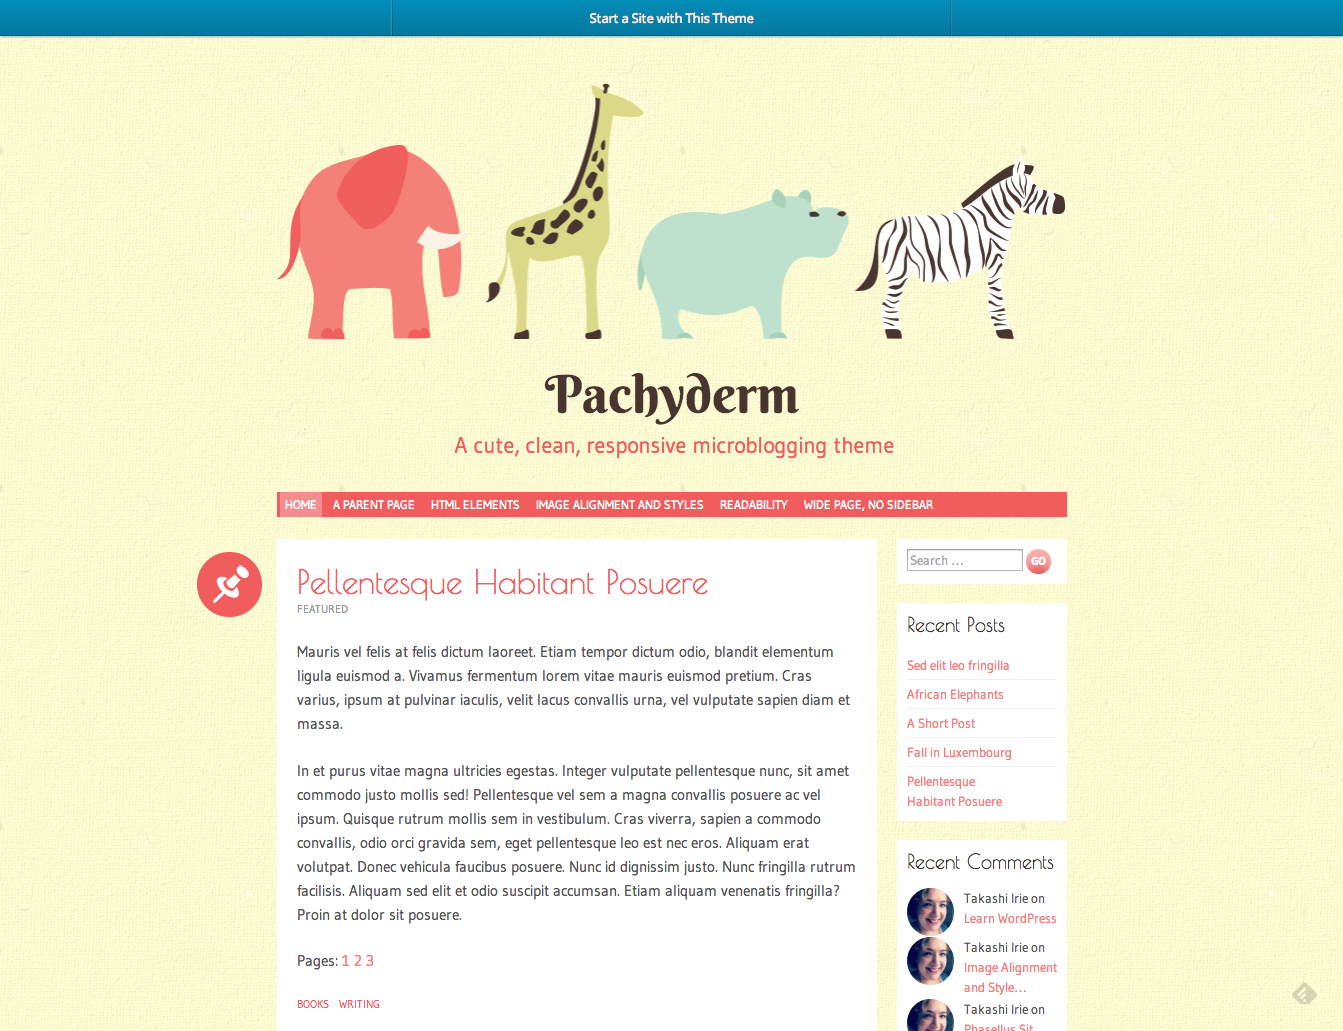 Pachyderm A cute clean responsive microblogging theme